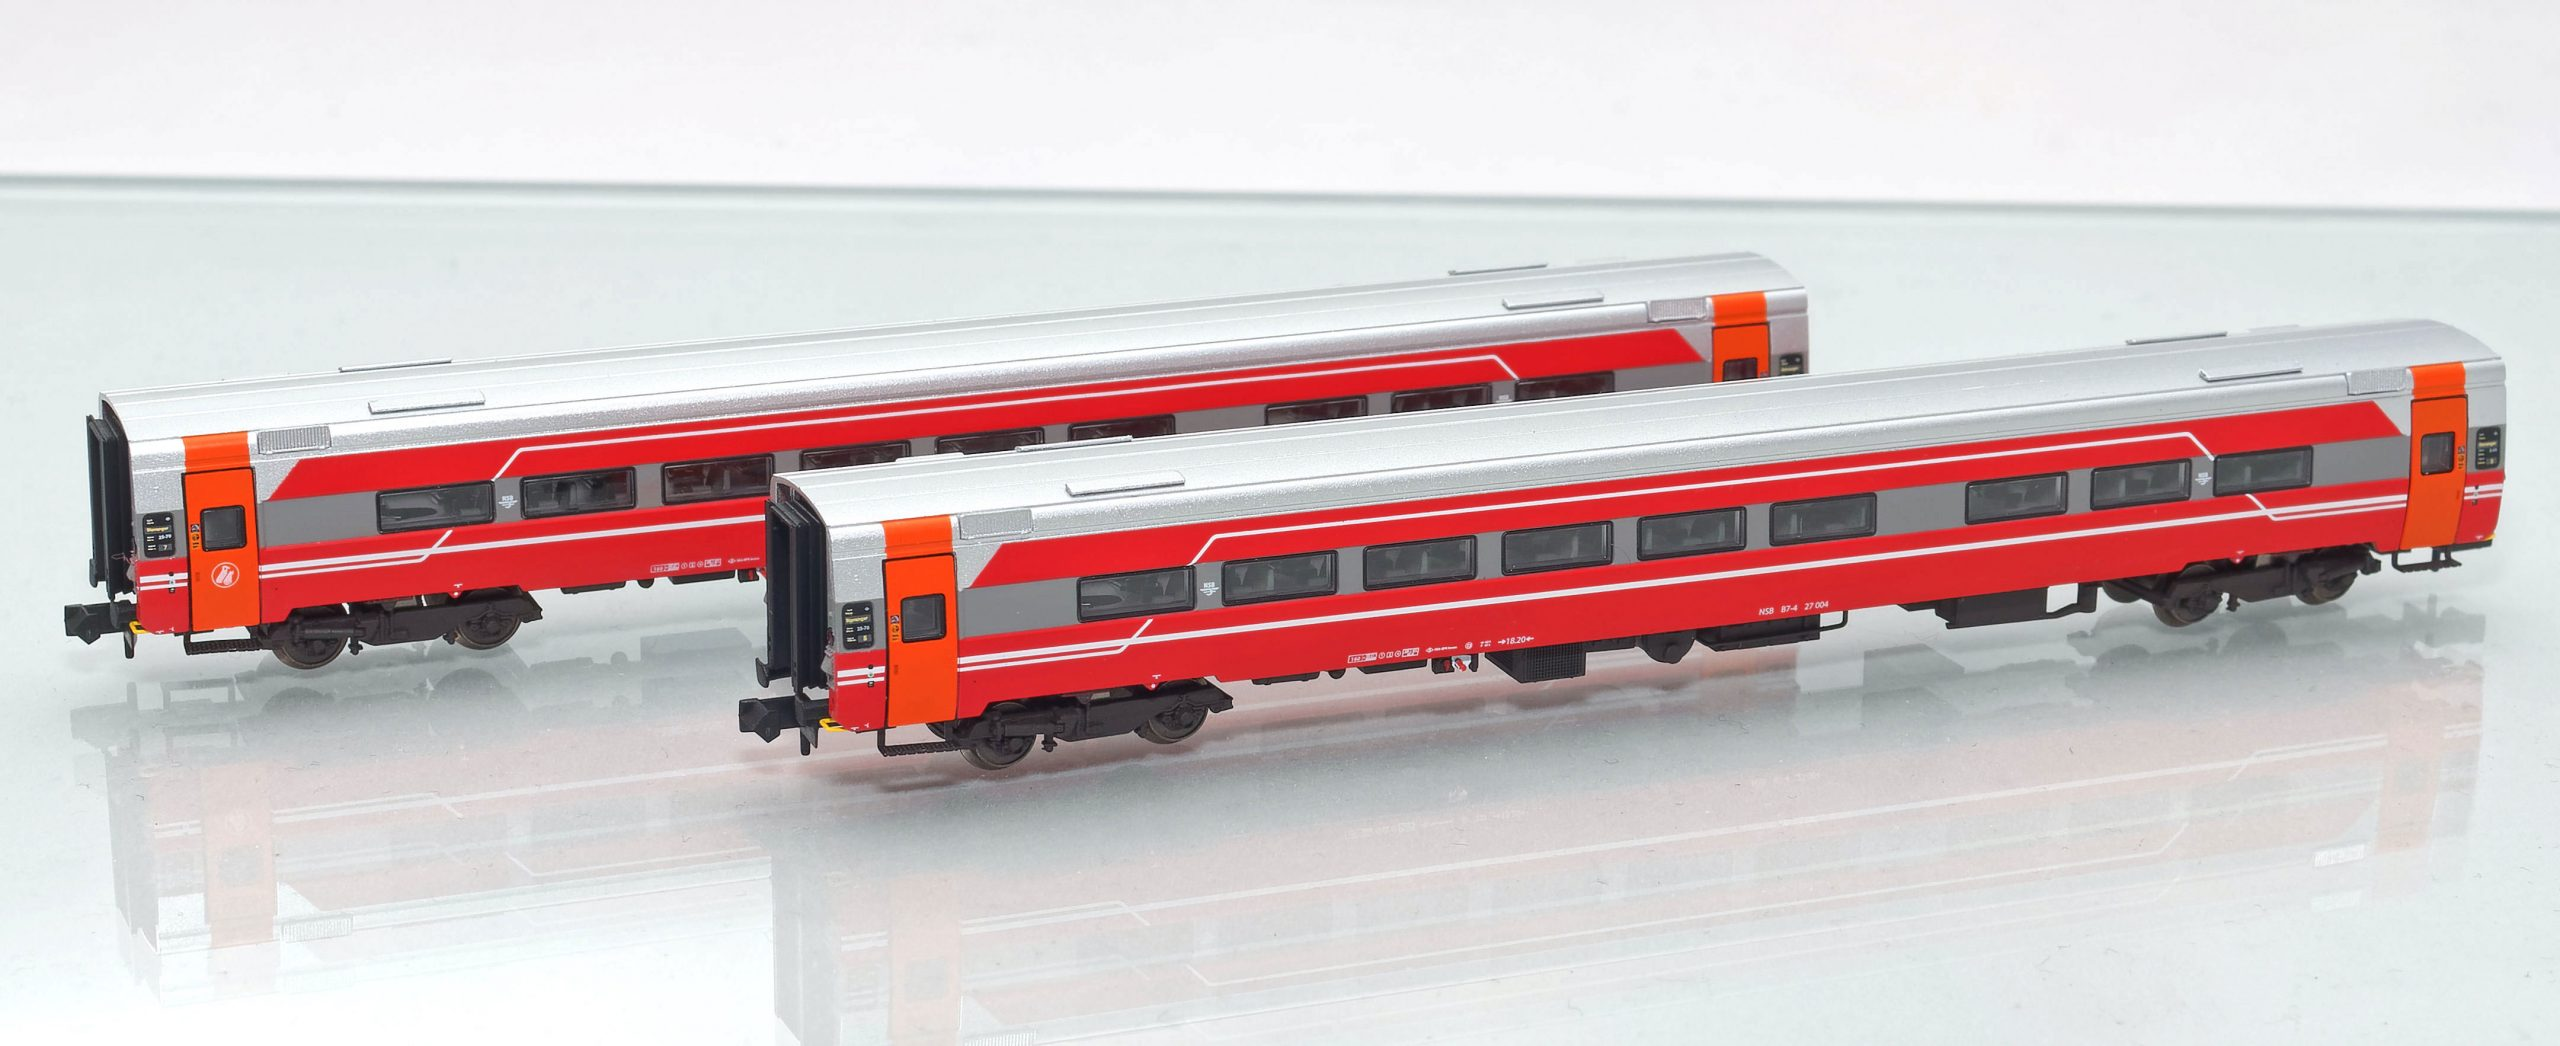 Set 188690: NSB Expresszugwagen B7-4undB7-5